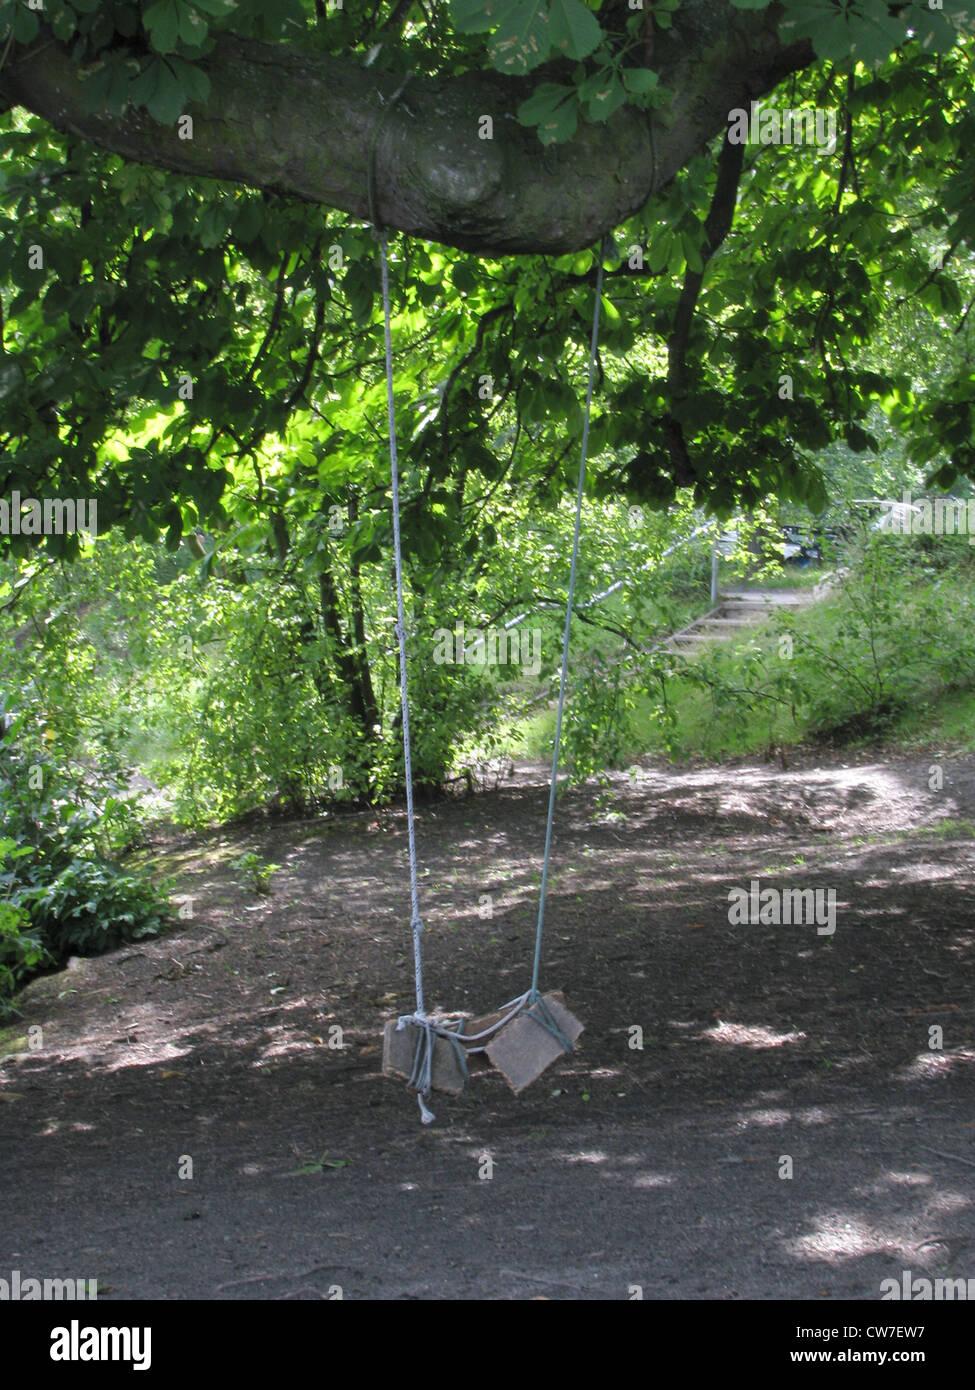 Wooden swing tree stockfotos wooden swing tree bilder for Der schaukelstuhl hamburg